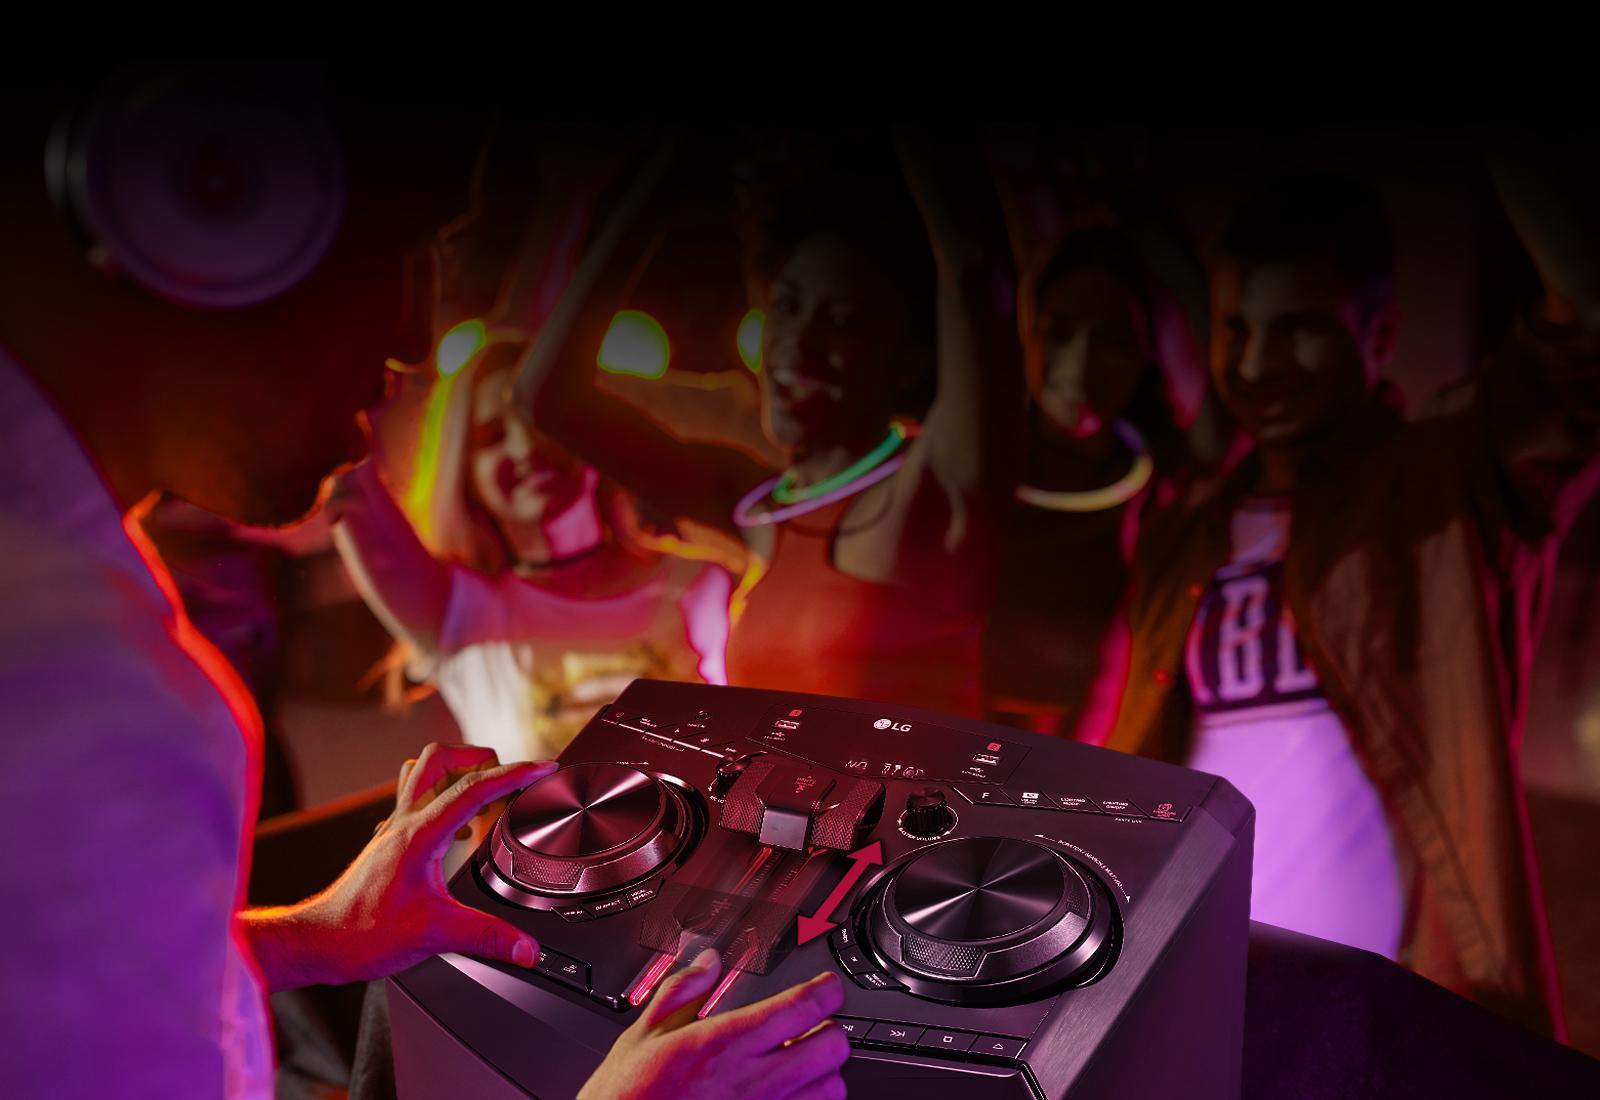 Lg Oj98 Xboom 1800w Hi Fi Speaker System With Bluetooth Audio Wiring Plans For Nightclub Party Thruster